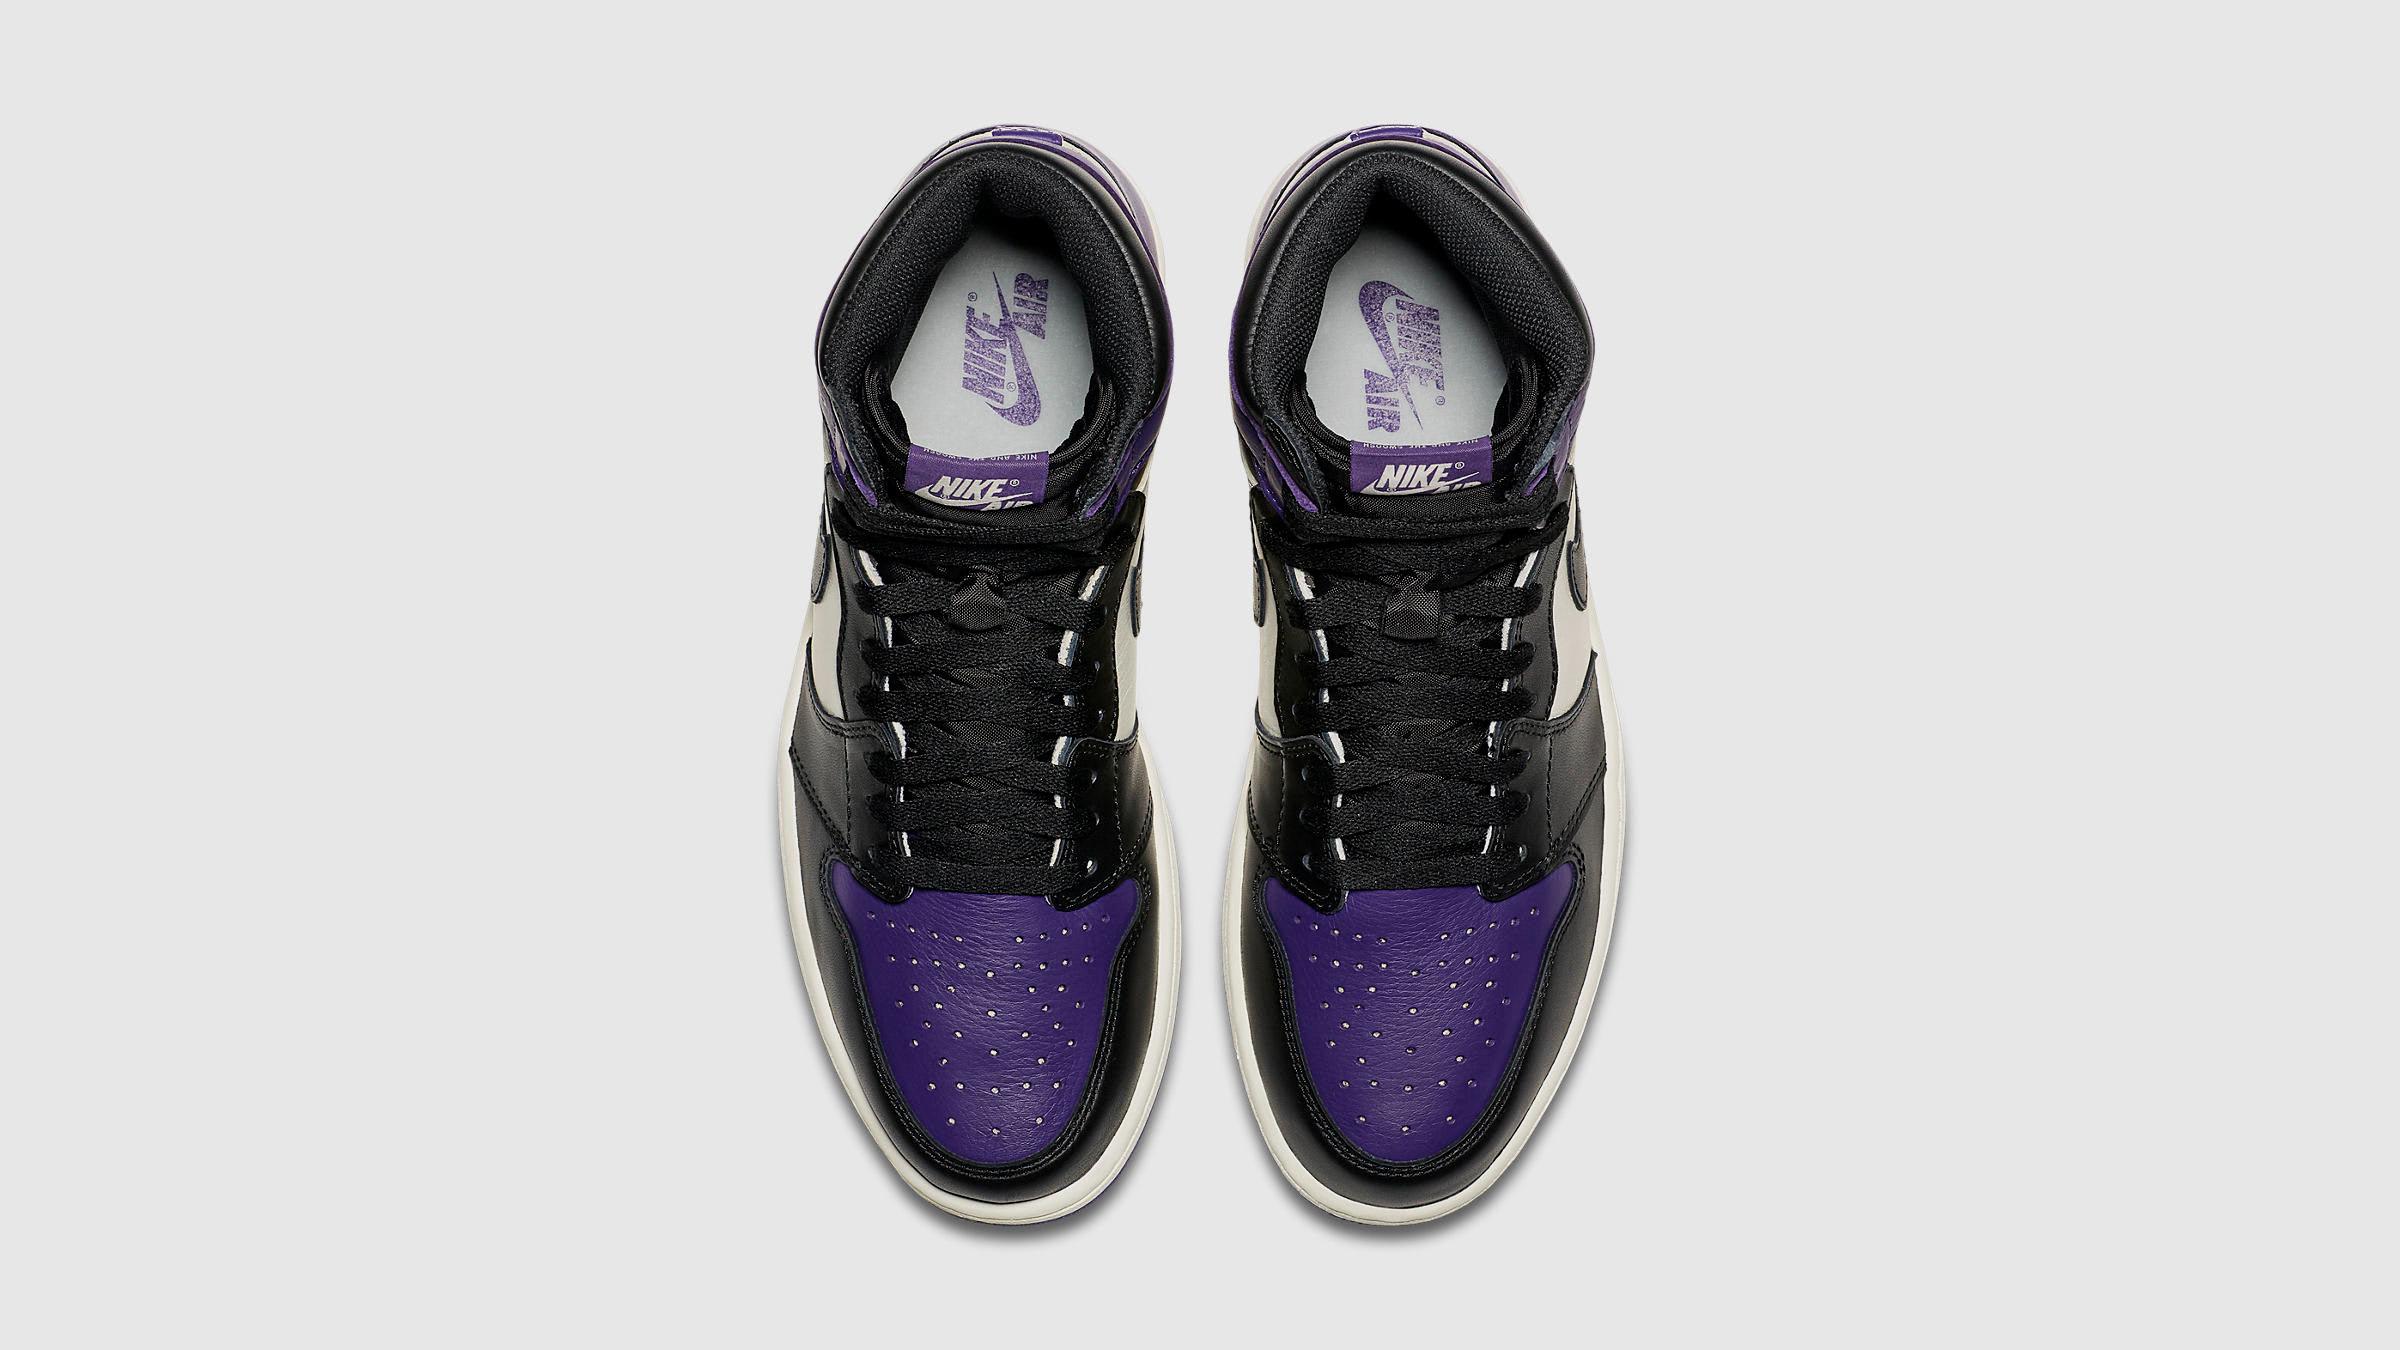 686a2977eb42 Nike Air Jordan 1 Retro High OG (Court Purple   White)